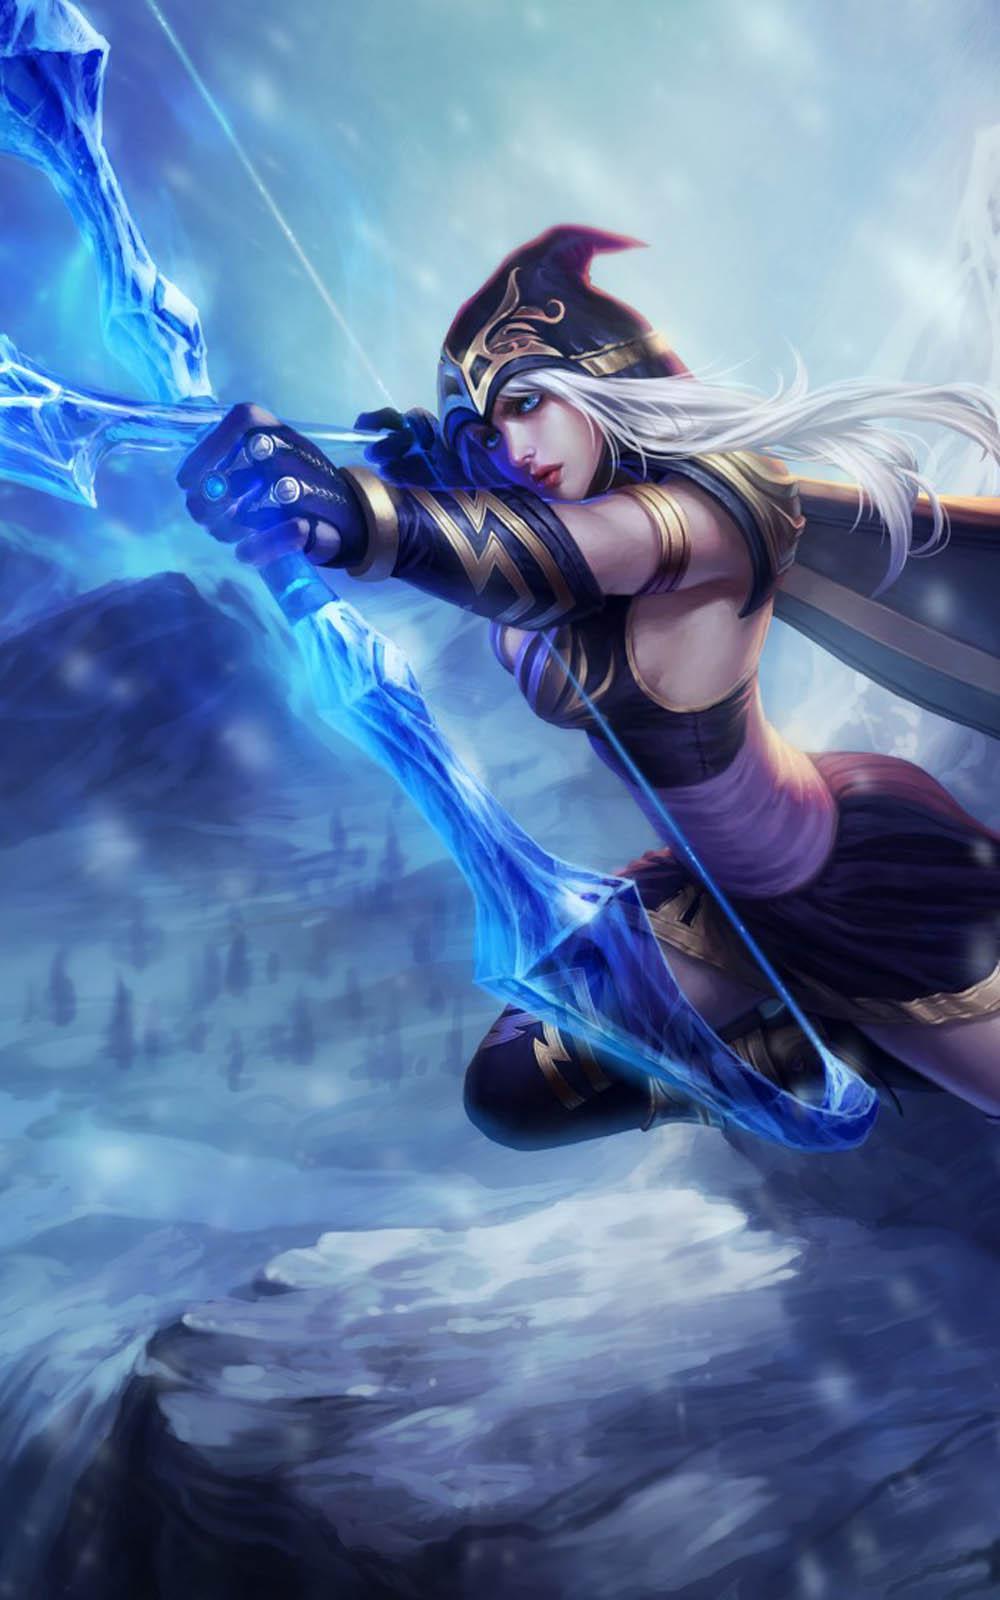 Download Ashe League Of Legends Hero Free Pure 4K Ultra HD Mobile Wallpaper